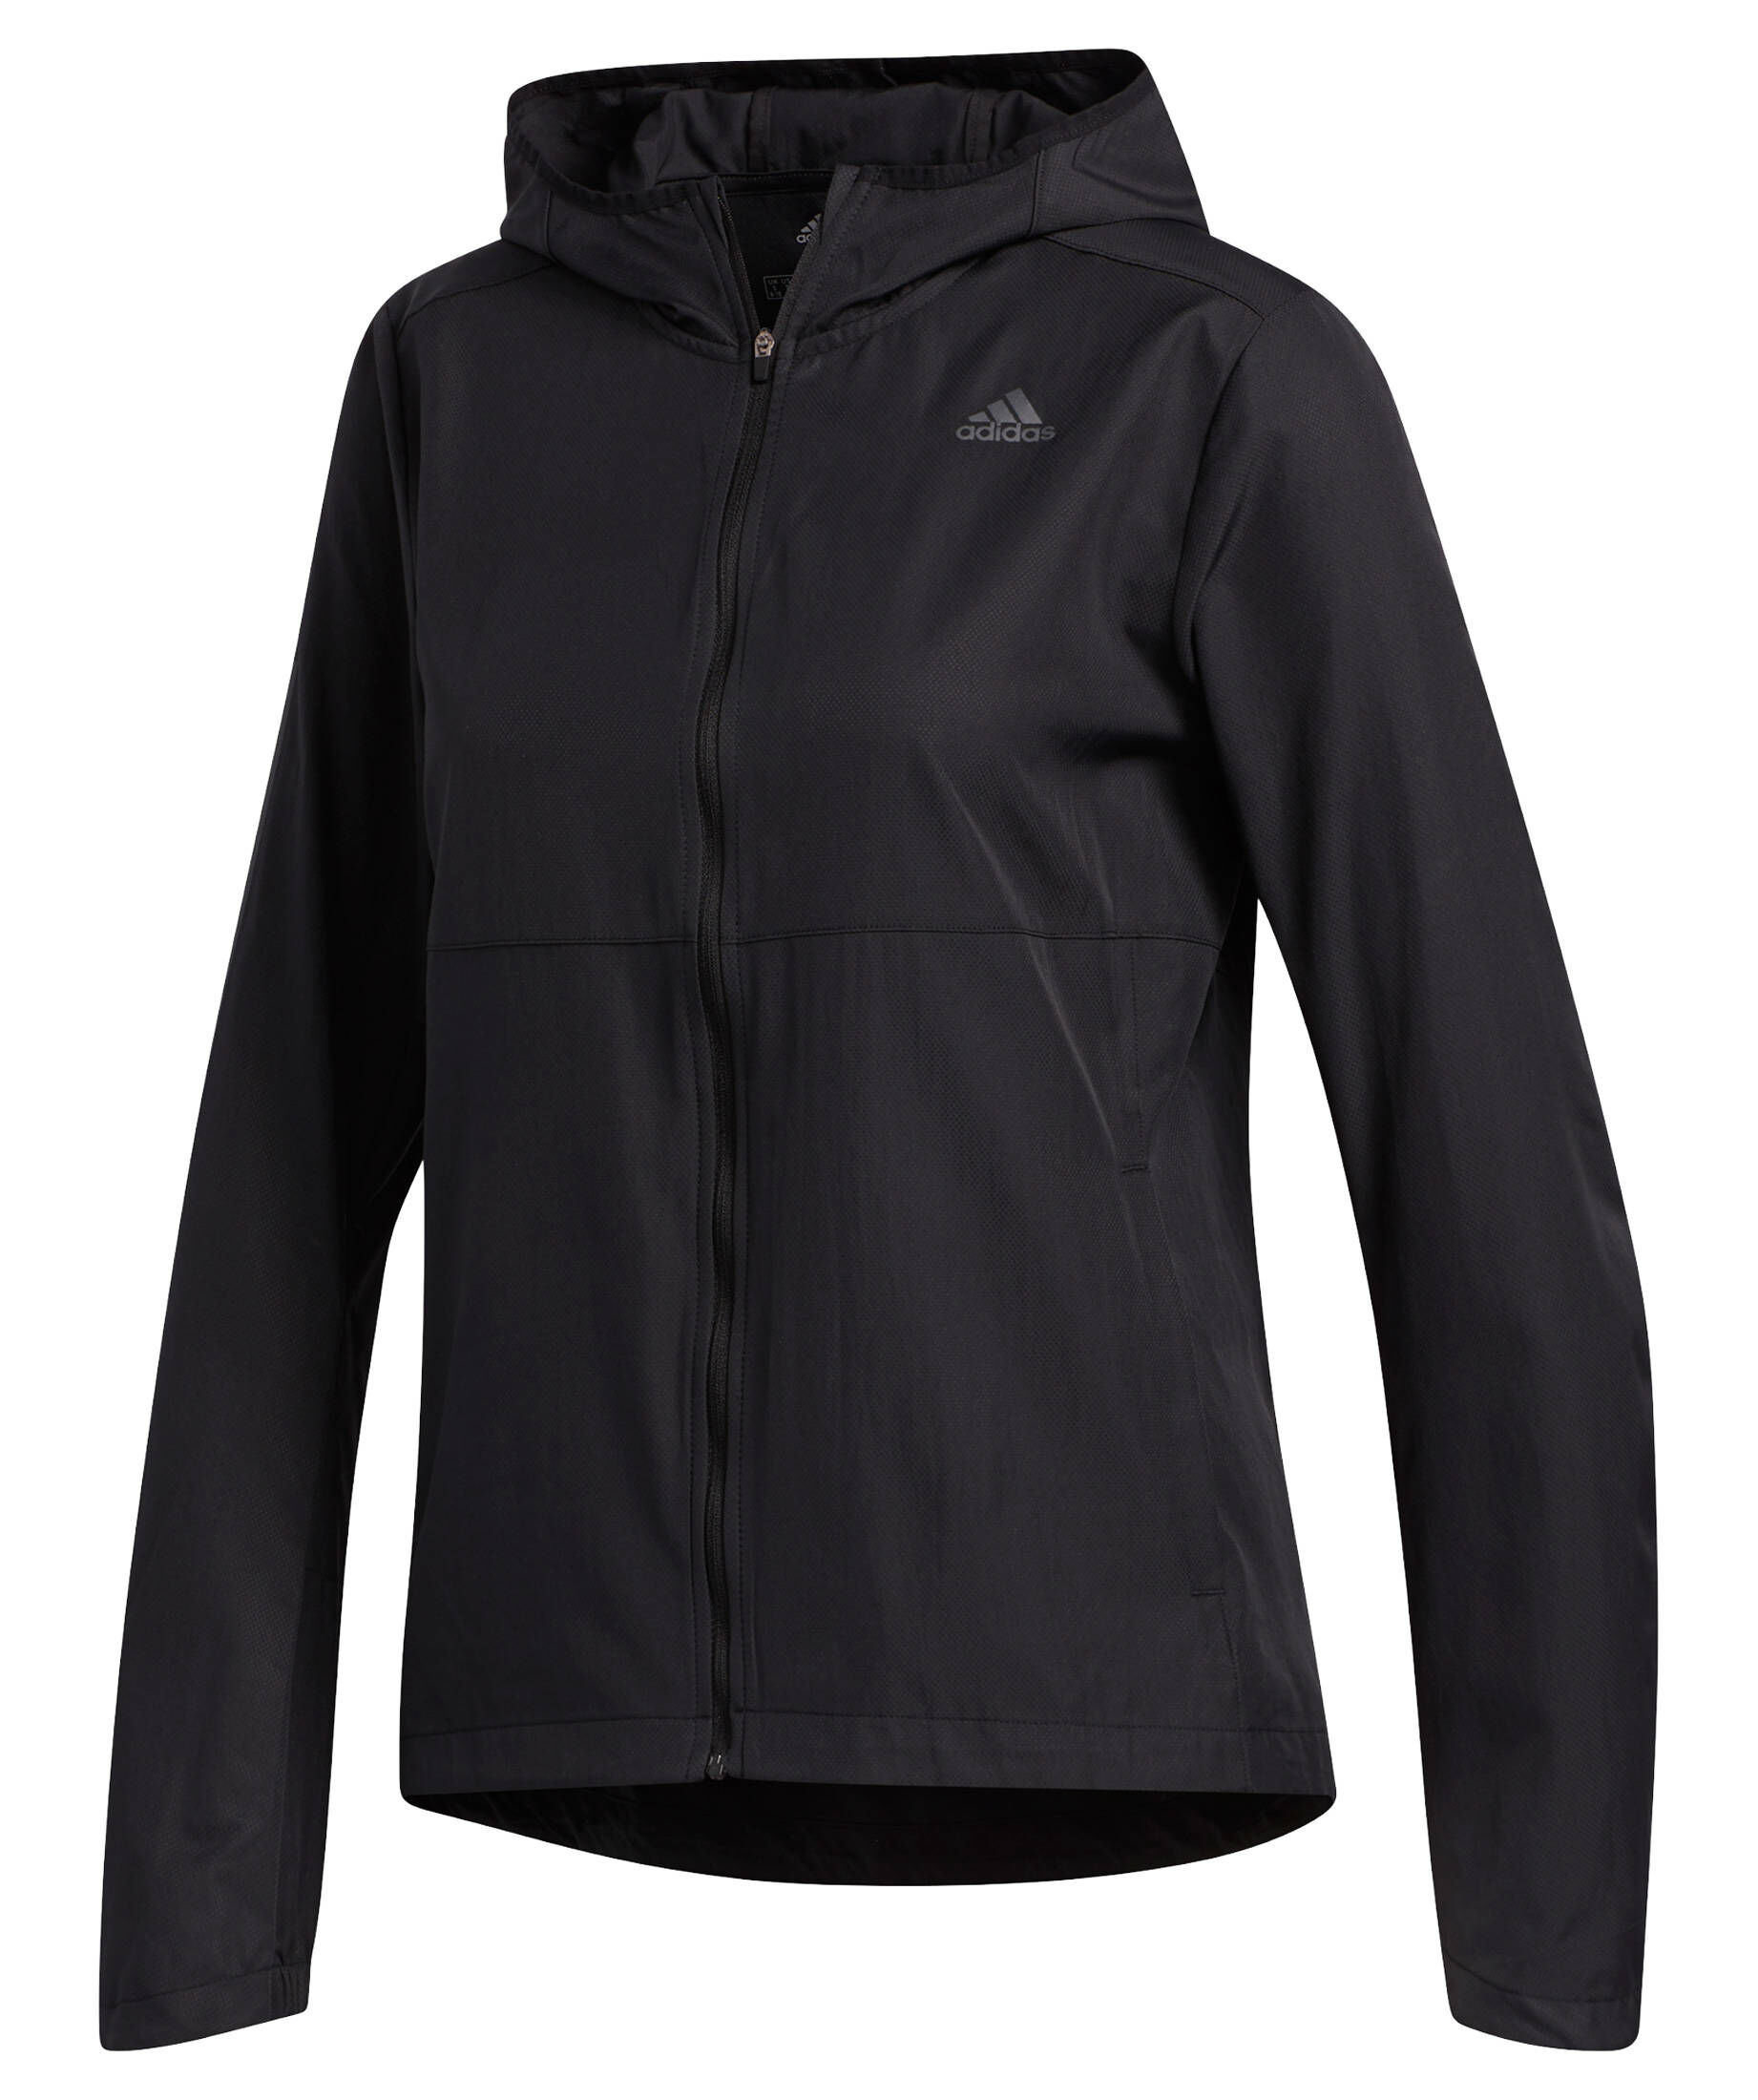 Adidas Performance Laufjacke »own The Run Jacket« Weiß